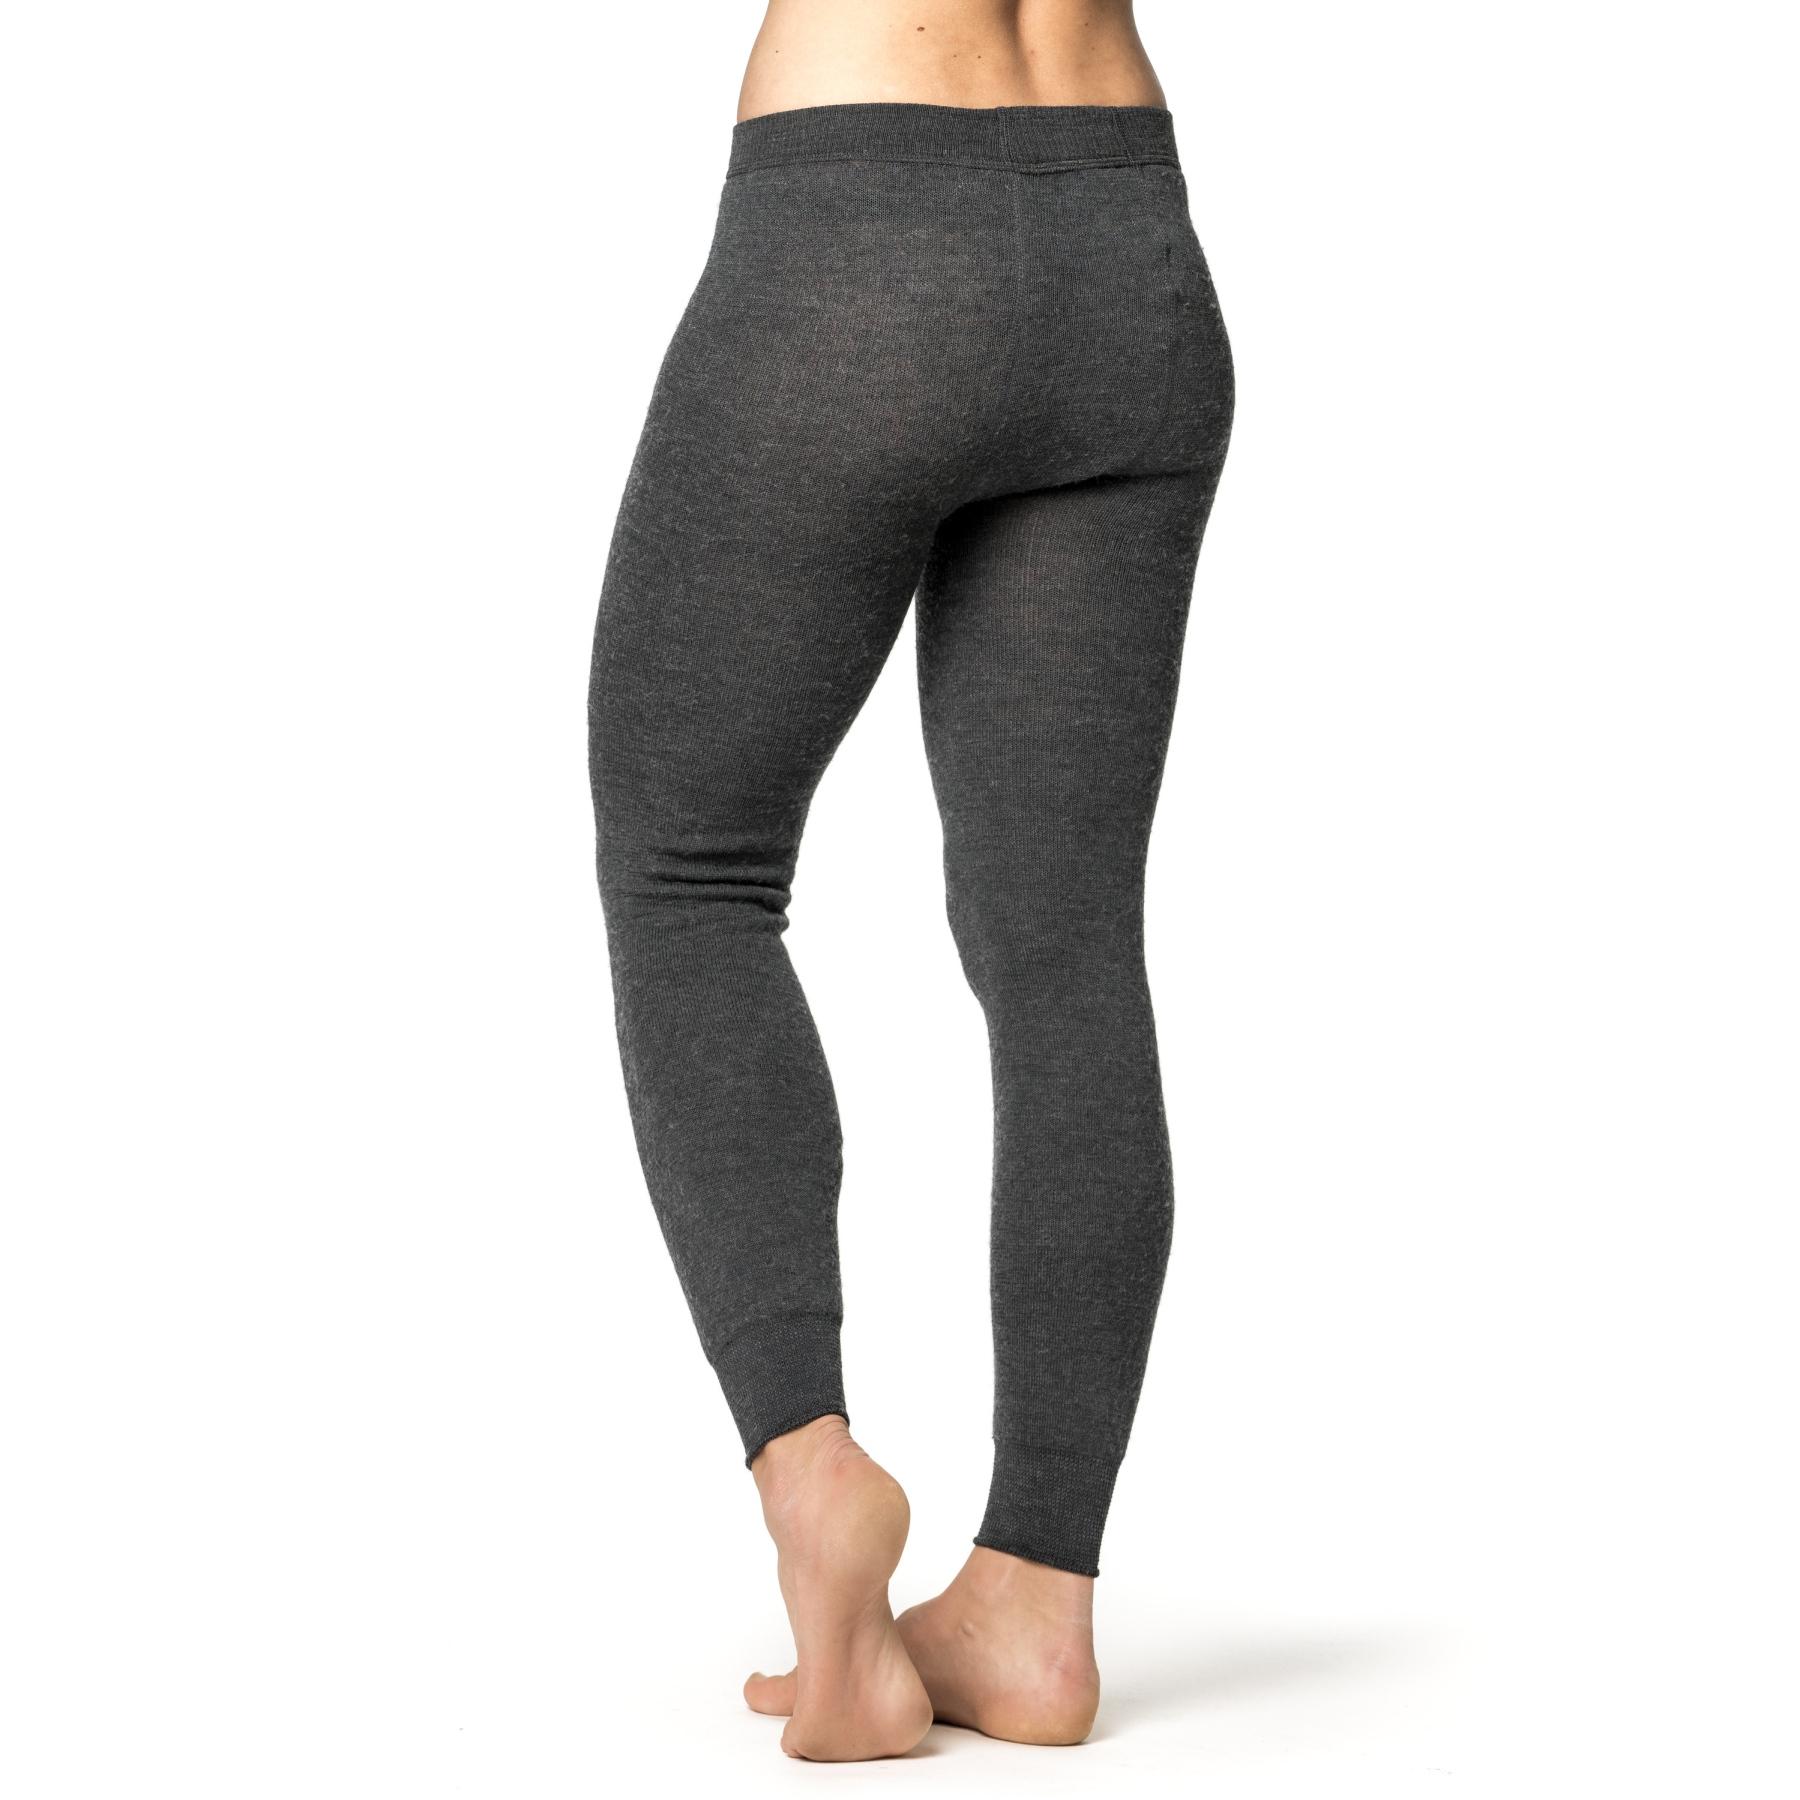 Image of Woolpower Long Johns 200 Unisex Underpants - grey